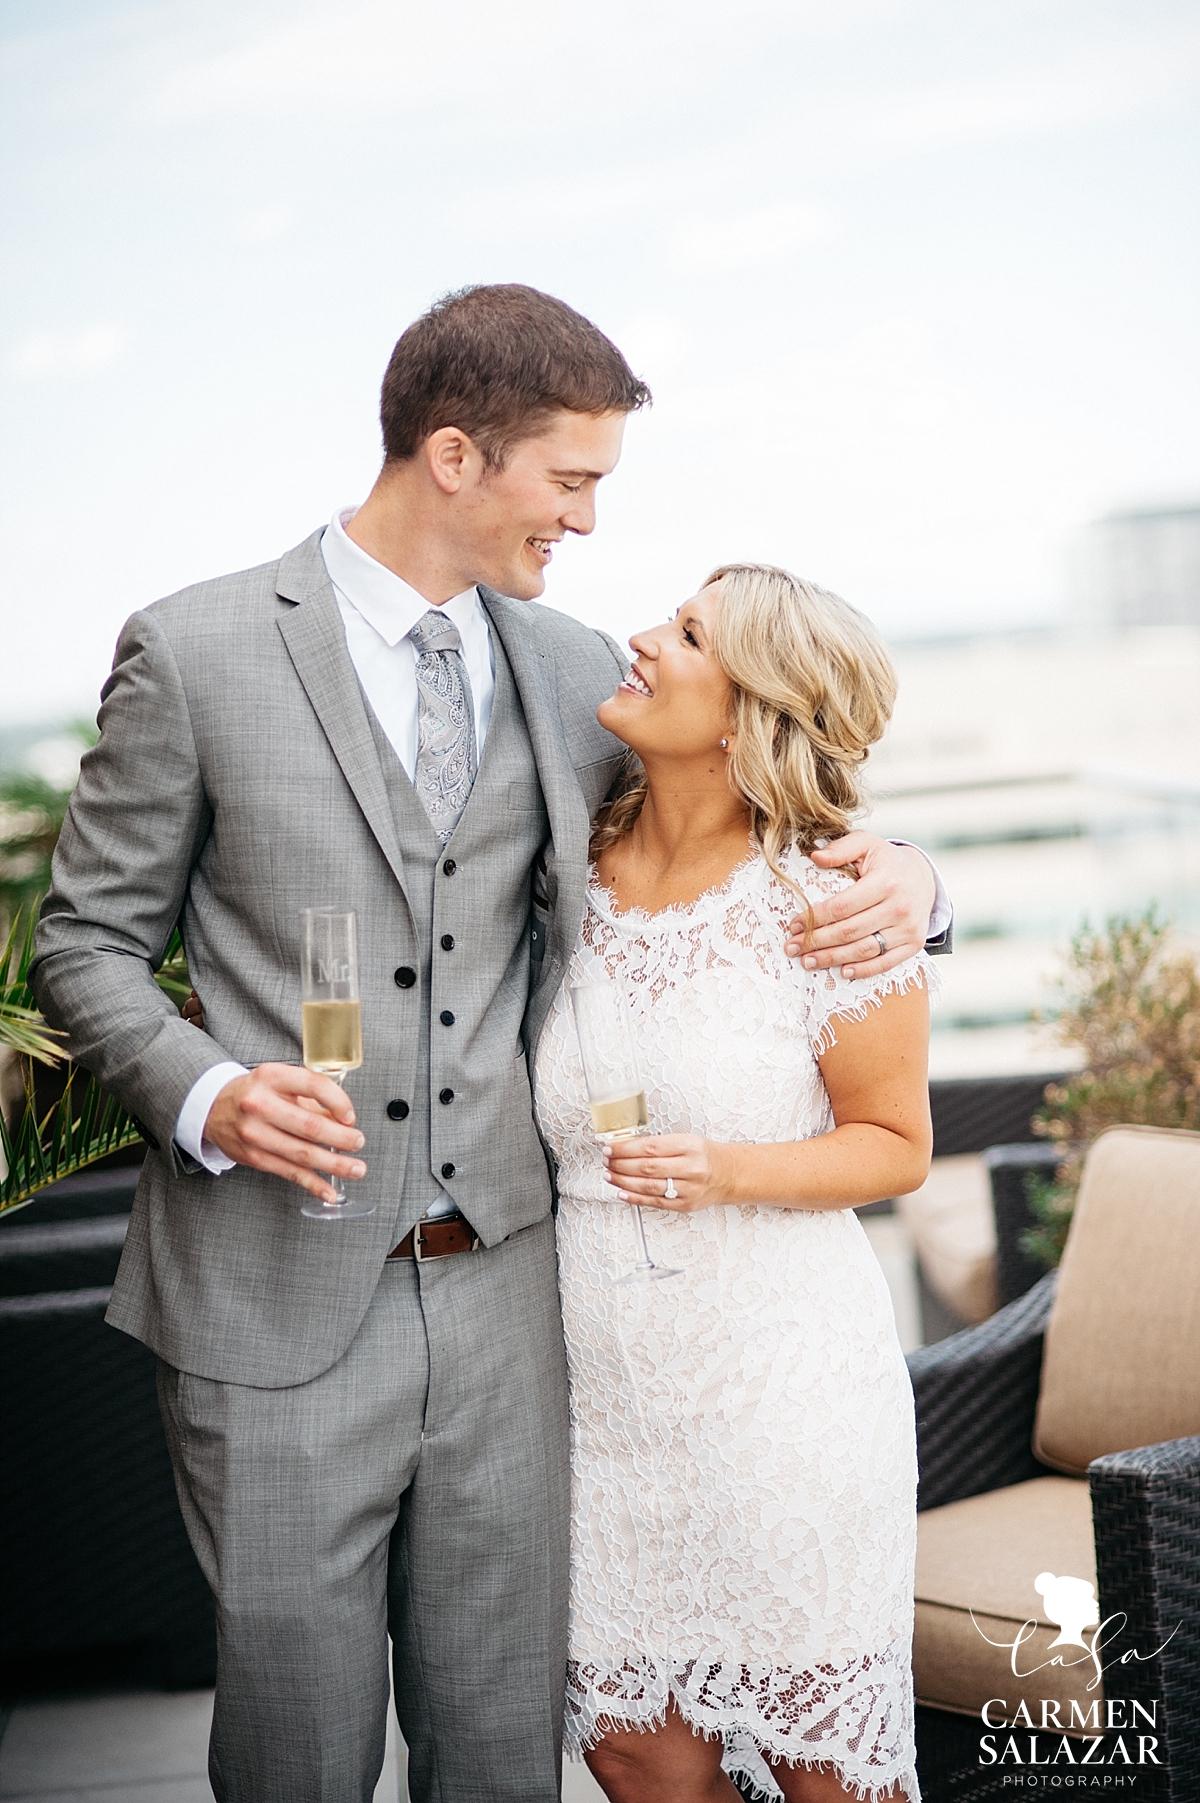 Happy newlywed portraits - Carmen Salazar